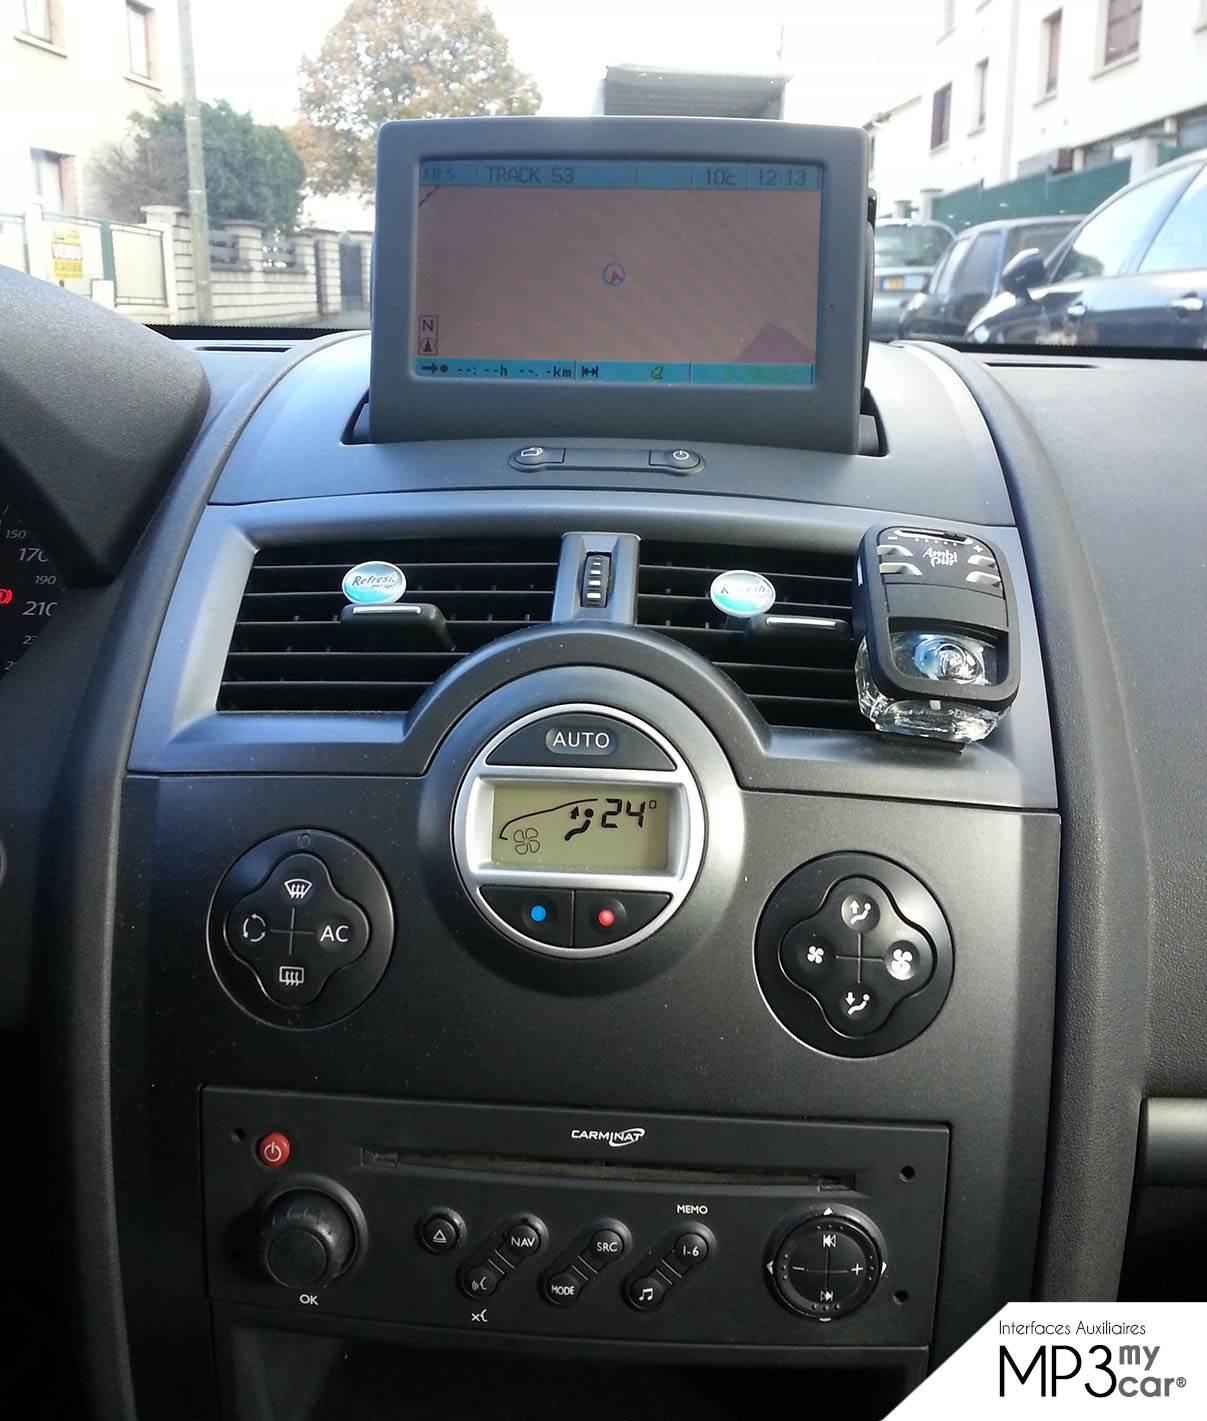 [Reduction] Mp3MyCar.fr : Interfaces USB, SD, AUX et Bluetooth Install_29